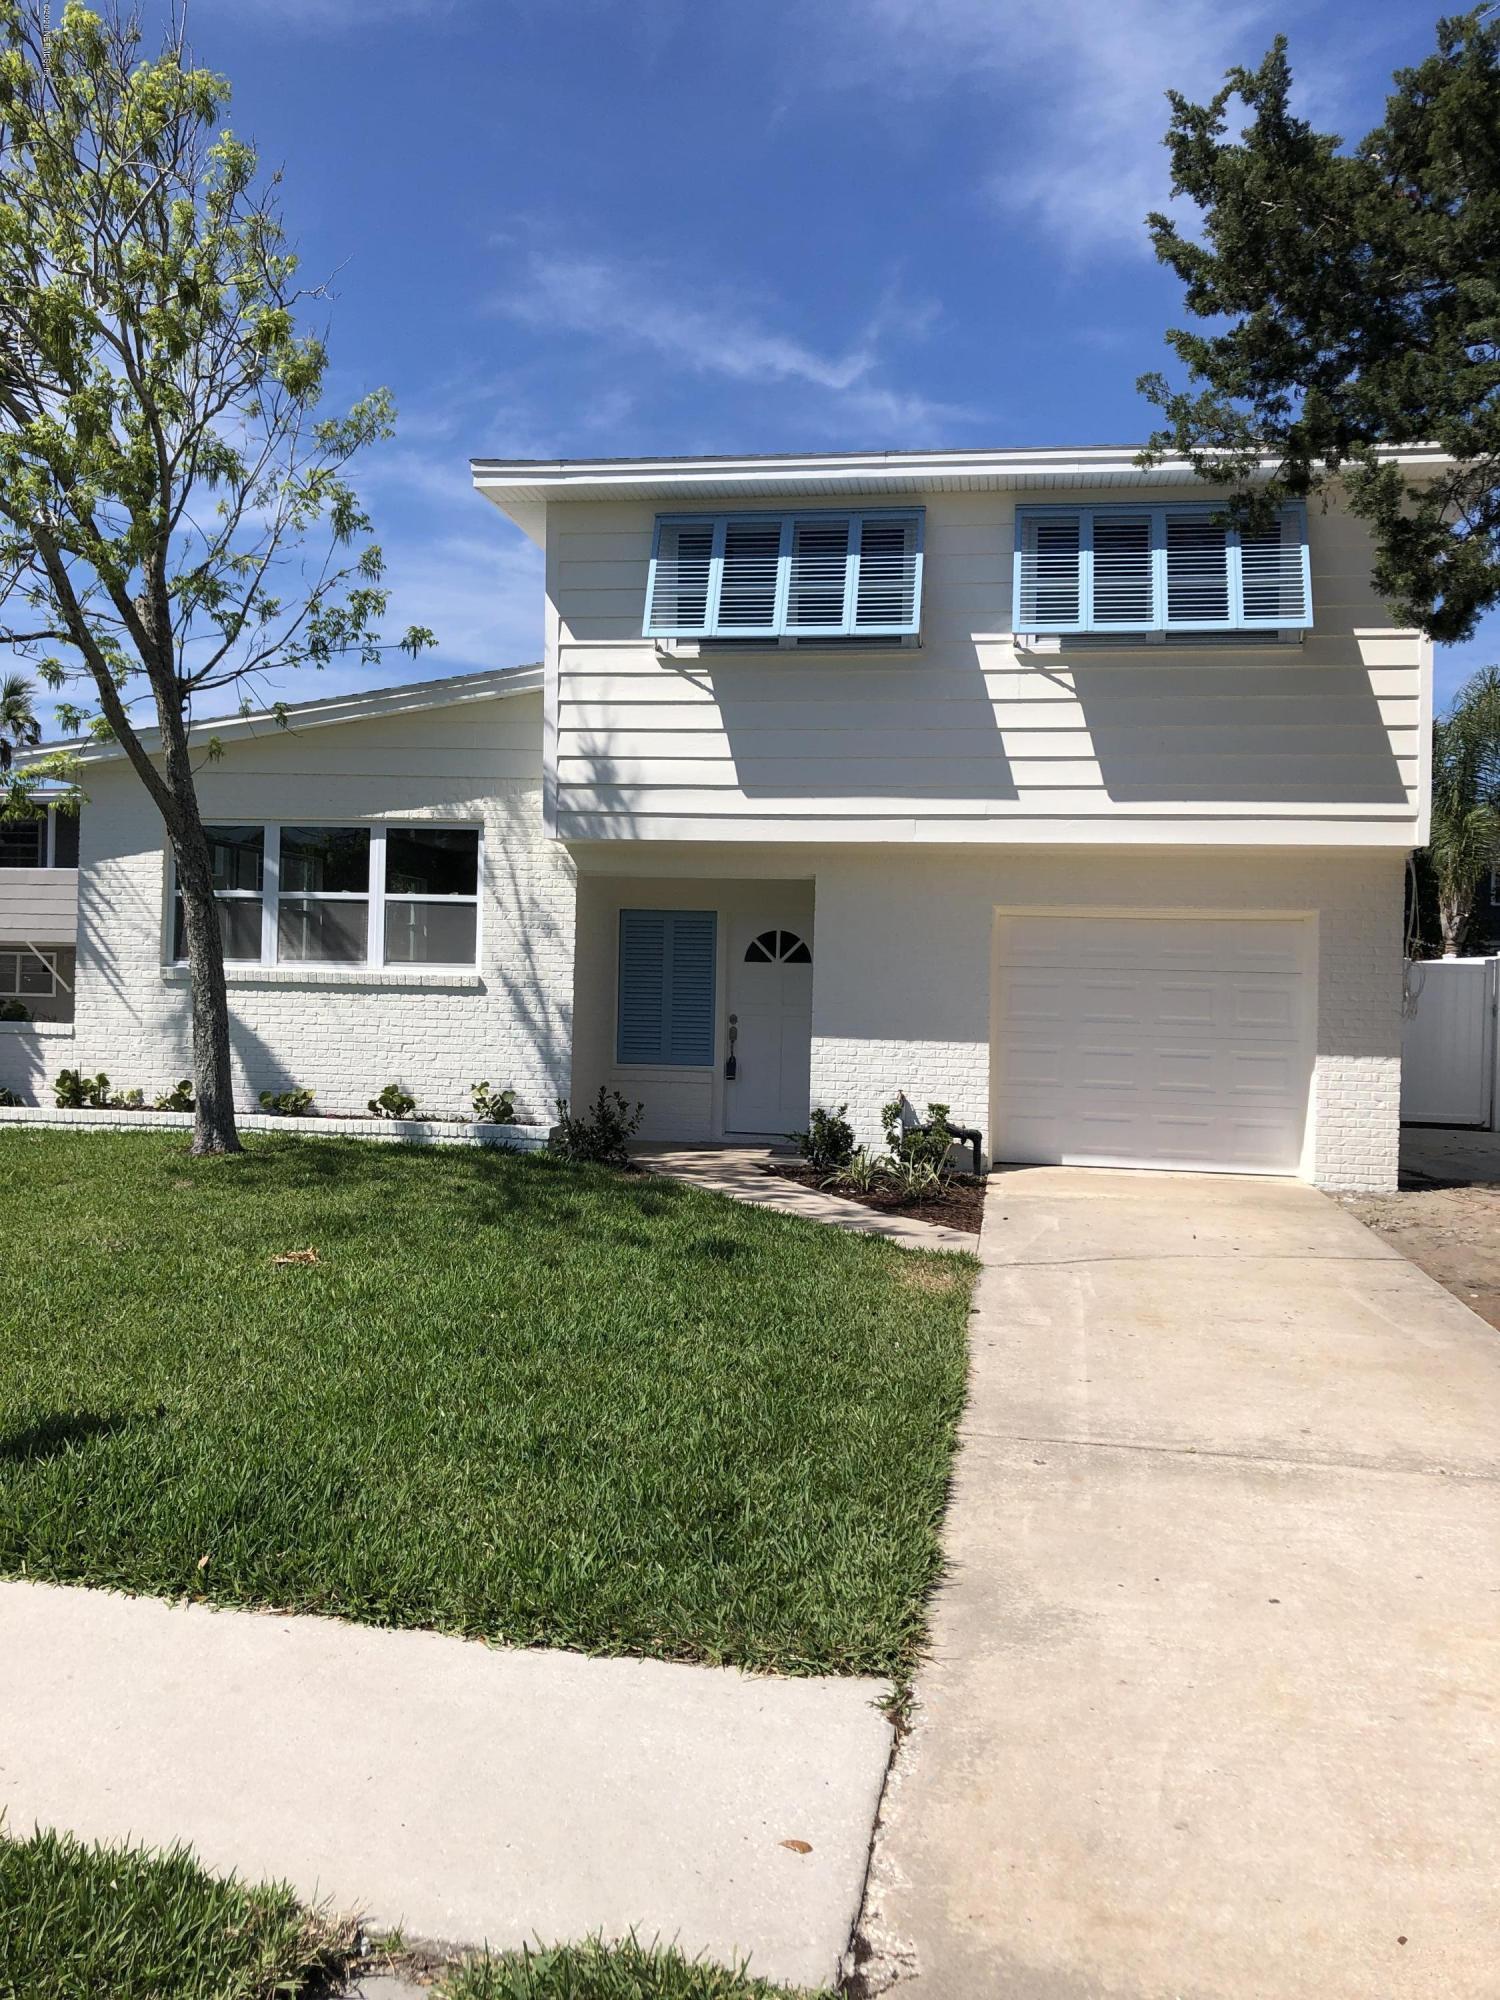 240 HOPKINS, NEPTUNE BEACH, FLORIDA 32266, 3 Bedrooms Bedrooms, ,2 BathroomsBathrooms,Residential,For sale,HOPKINS,1043577